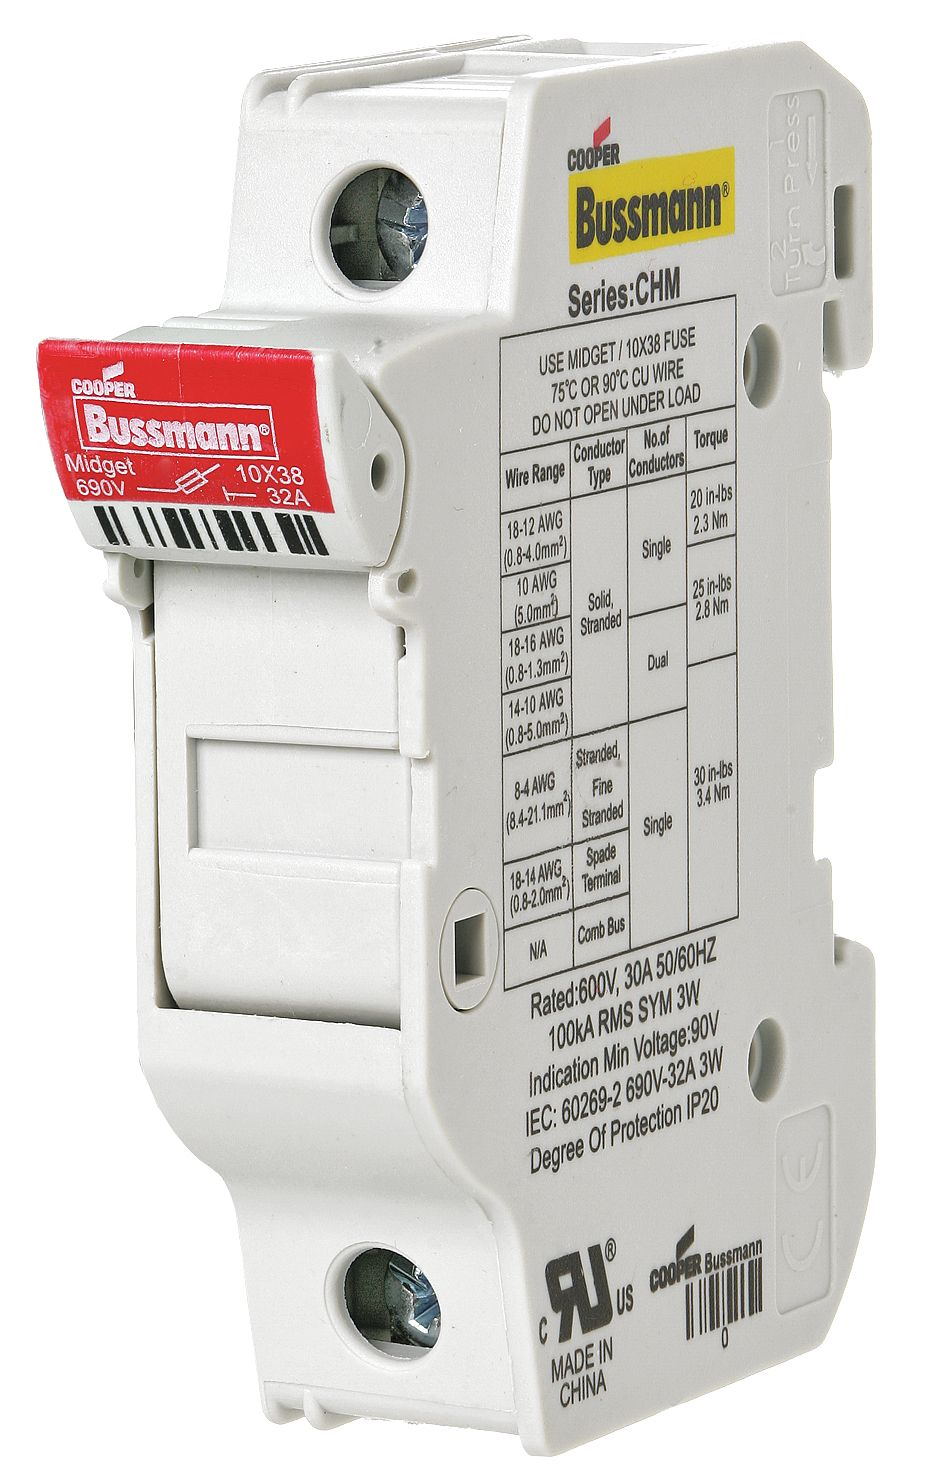 Chm1du Cooper Bussmann Datasheet 30 Amp Screw In Fuse Box